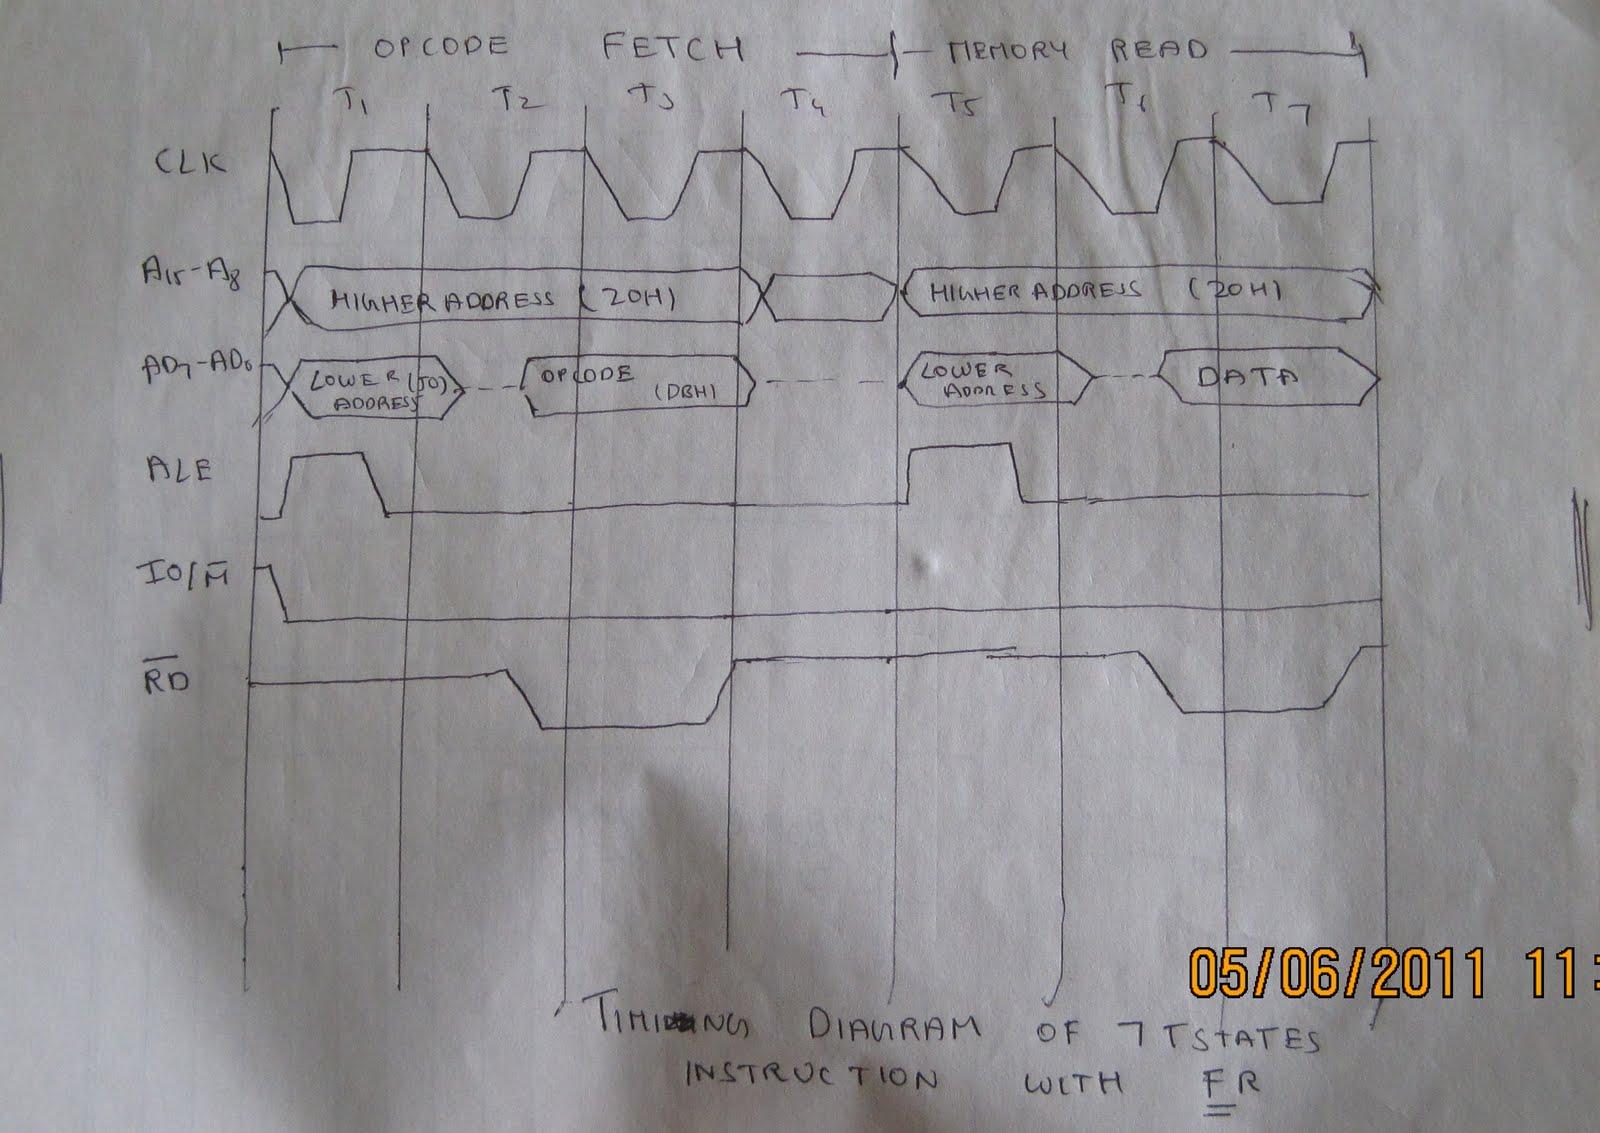 MICROPROCESSOR AND MICROCONTROLLER: June 2011